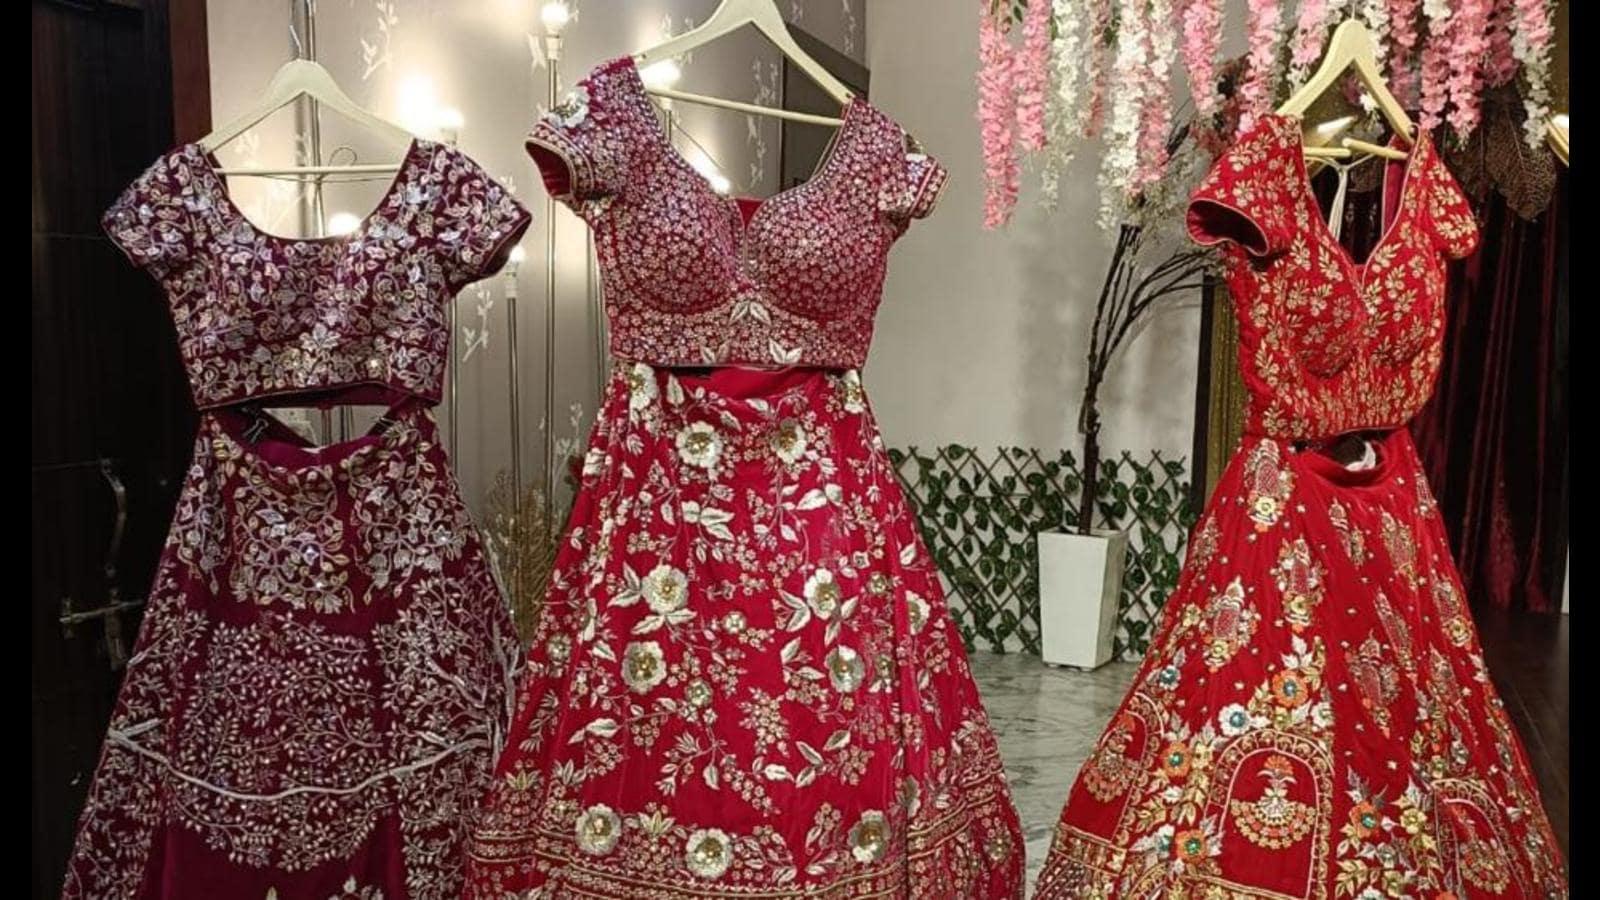 Designers pin hopes on upcoming festive season